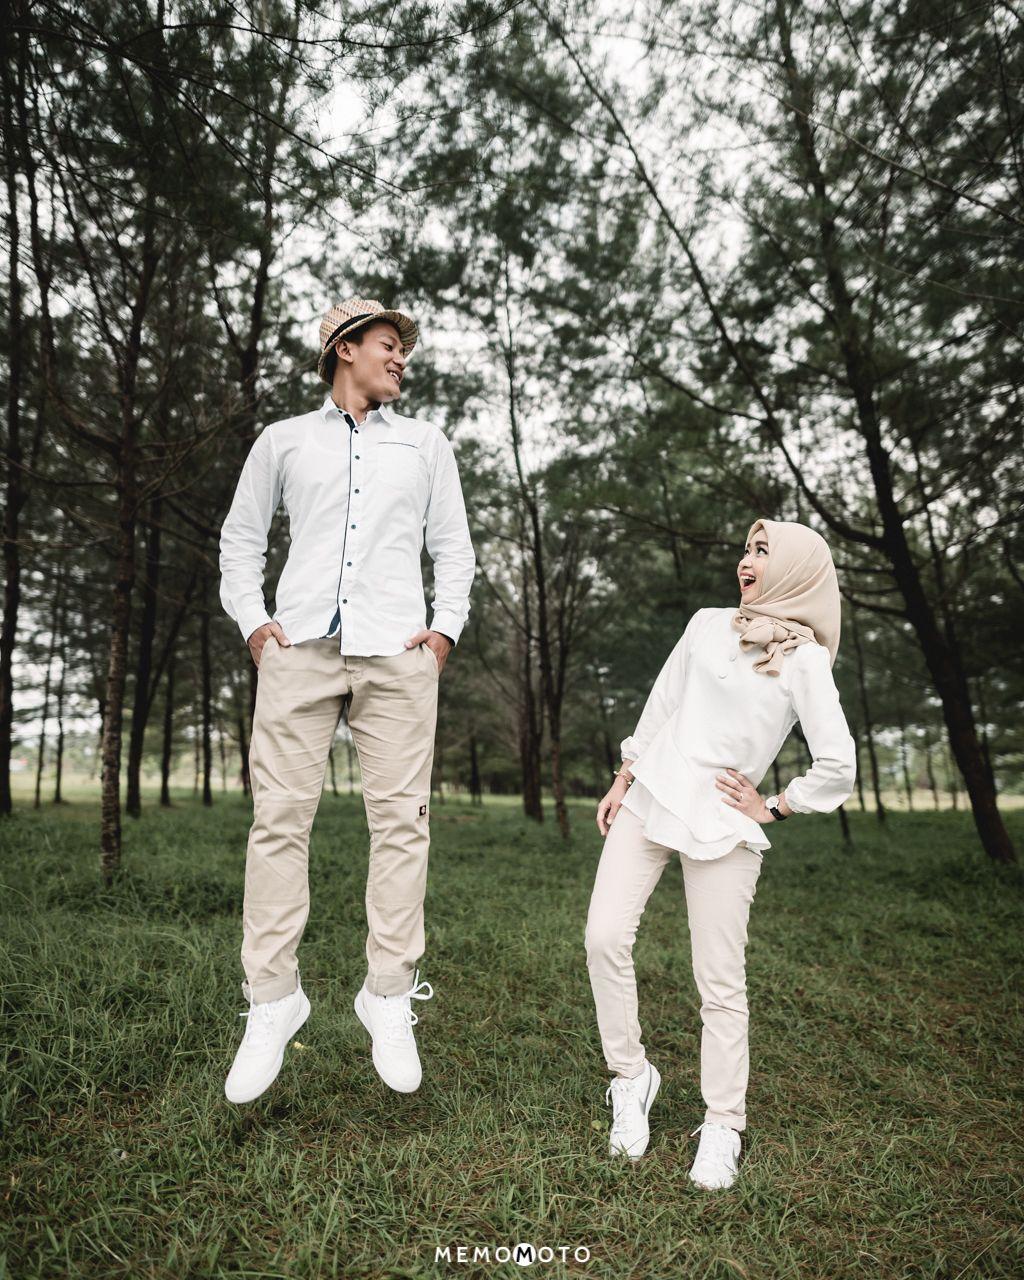 Outdoor Photo Prewedding Di Pantai Teleng Ria Pacitan Burhan Rizza Photo Memo Studio Wedding Pacitan Prew Foto Perkawinan Foto Tunangan Pose Perkawinan